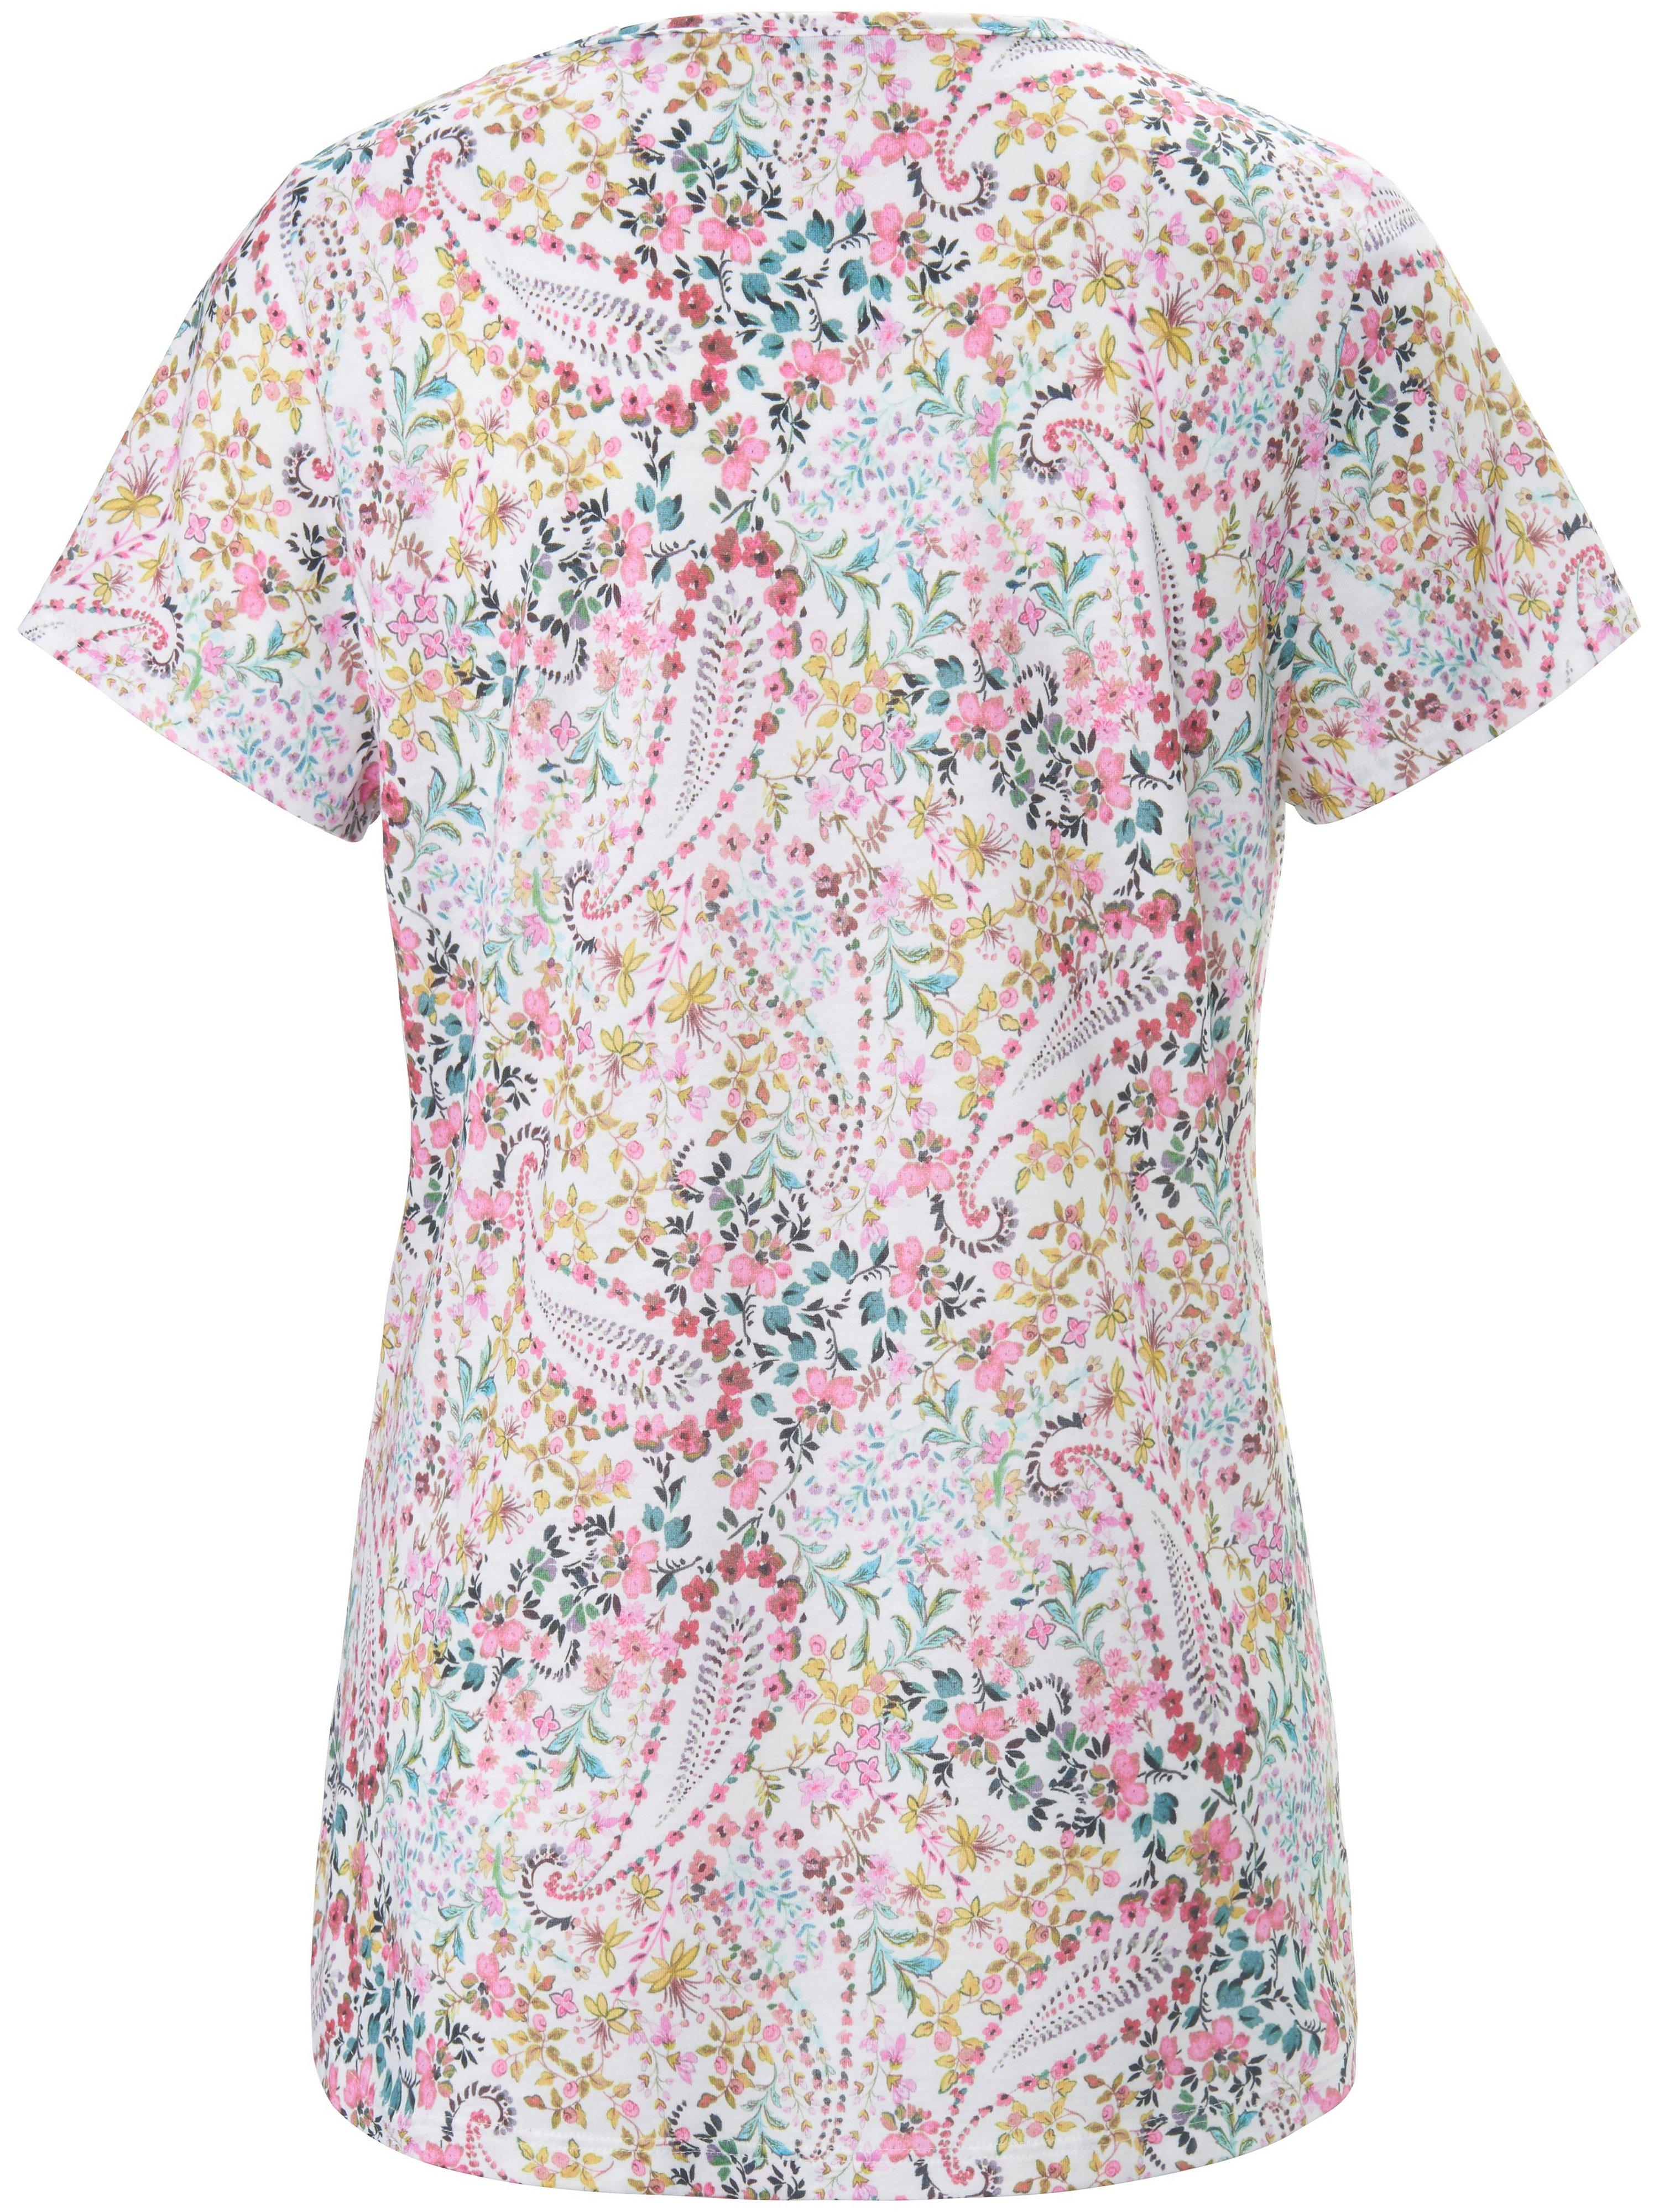 Pyjamas i singlejersey Fra Fürstenberg beige